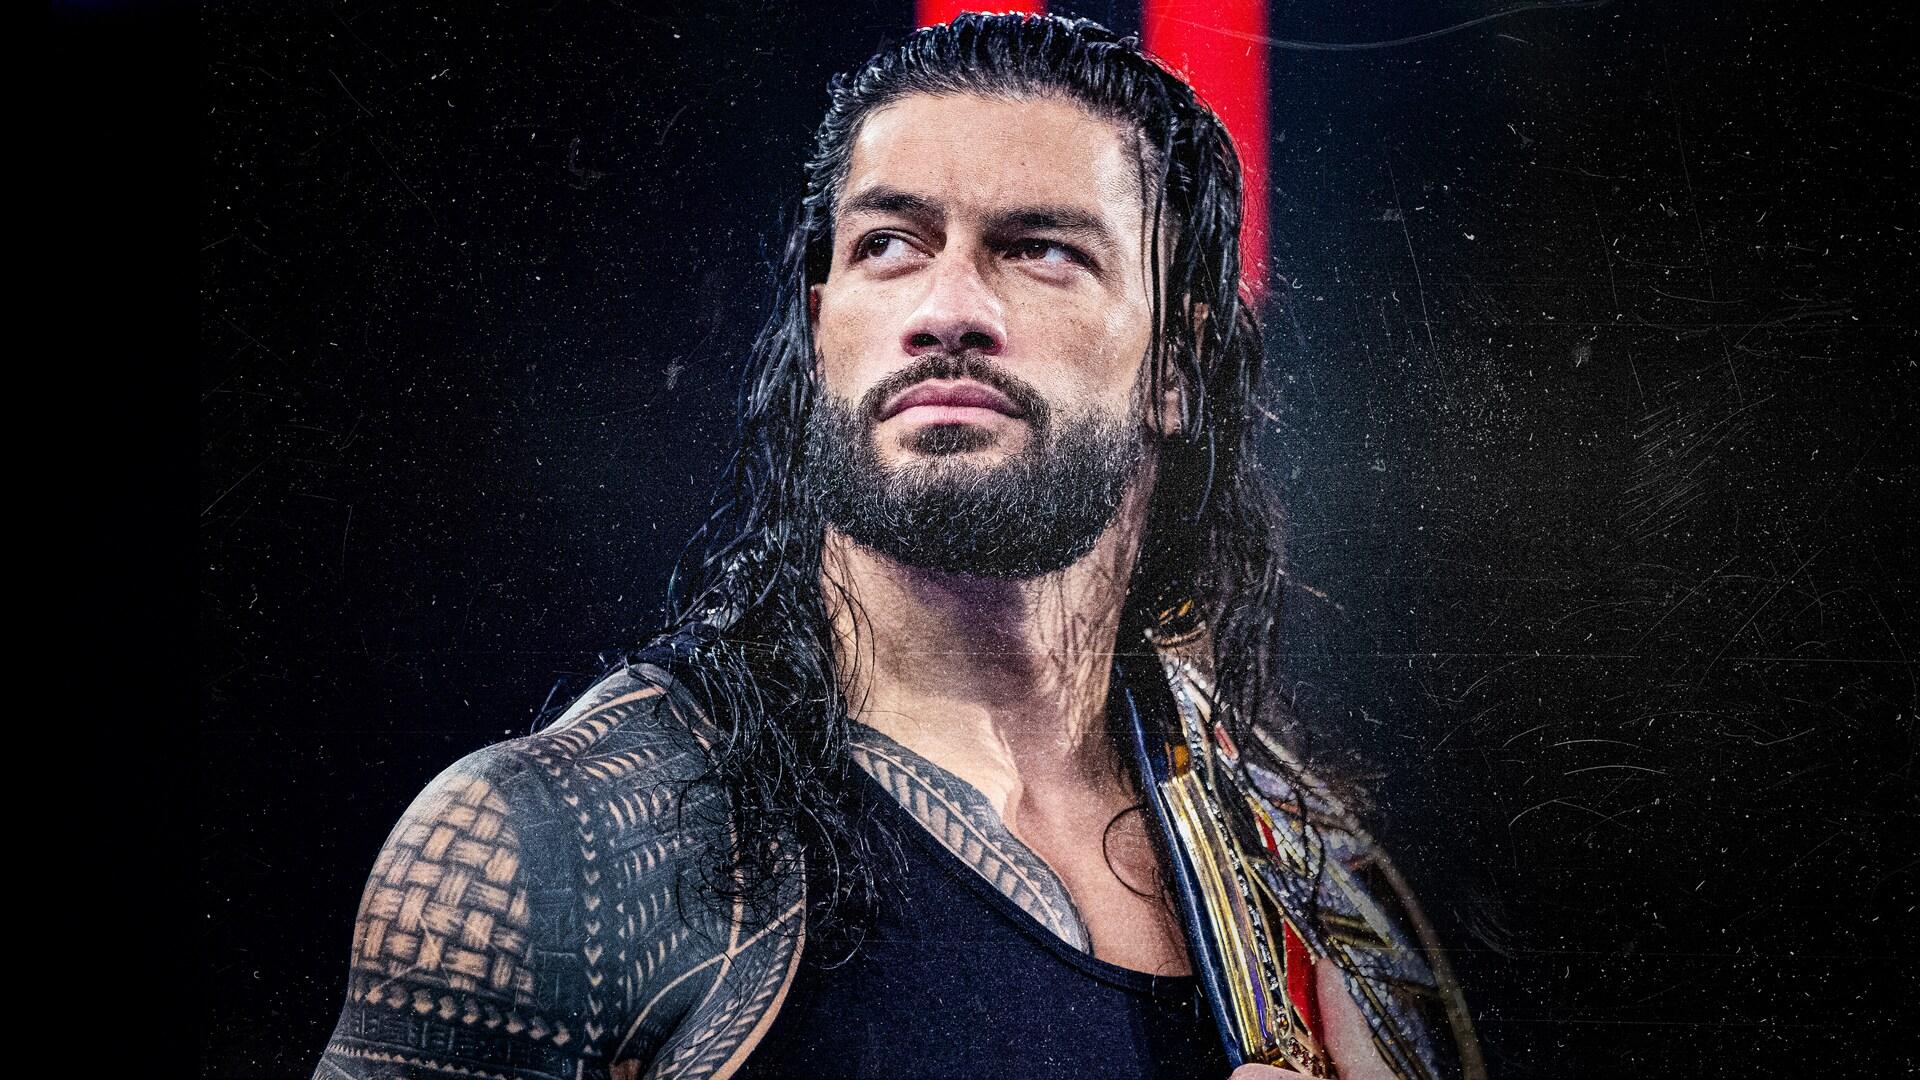 Roman Reigns' Championship Matches